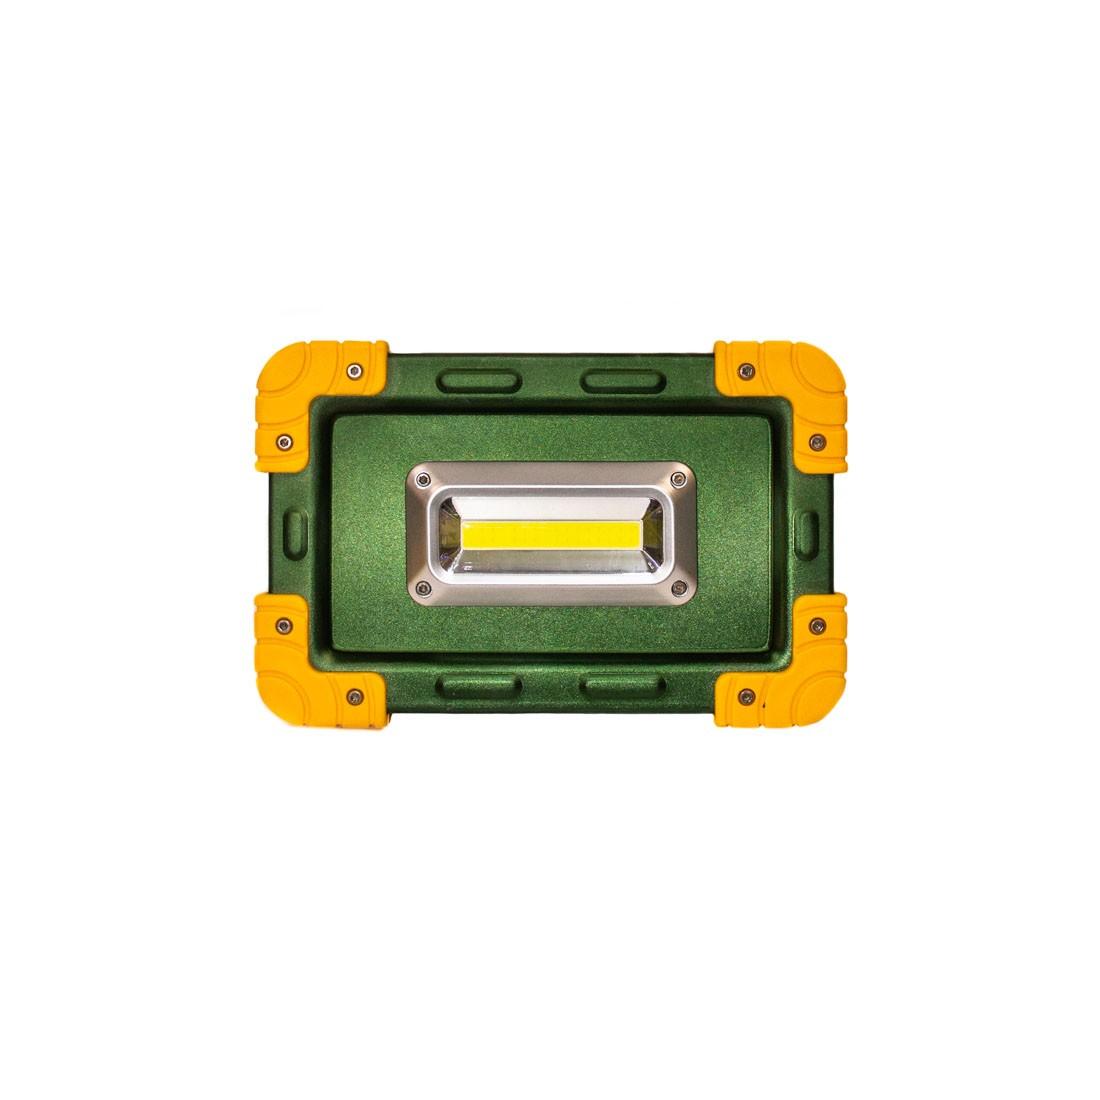 LED Лампа 30W с аккумулятором W822 оптом